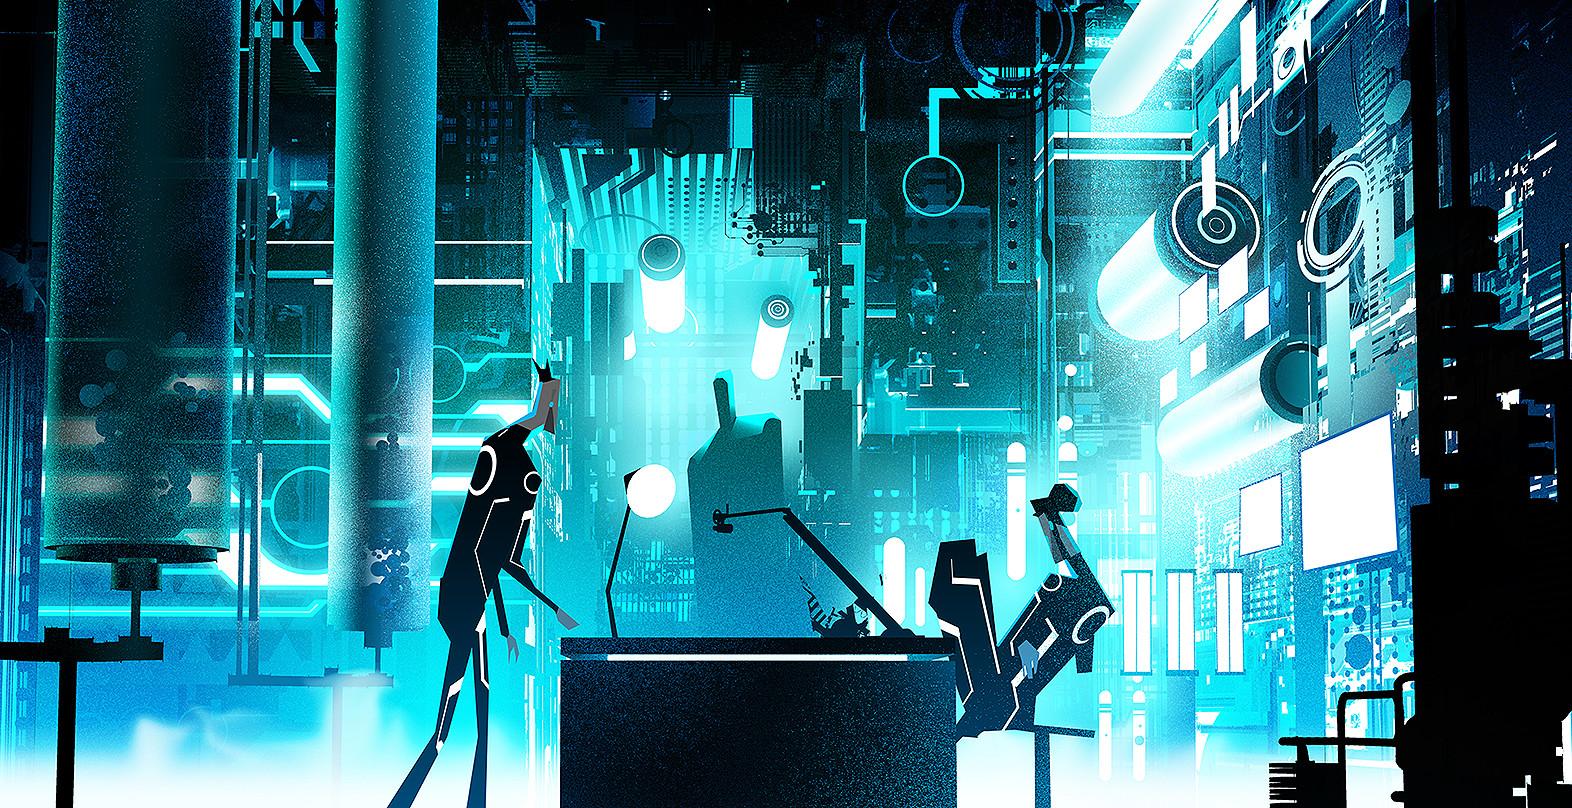 Tron Uprising Concept Art